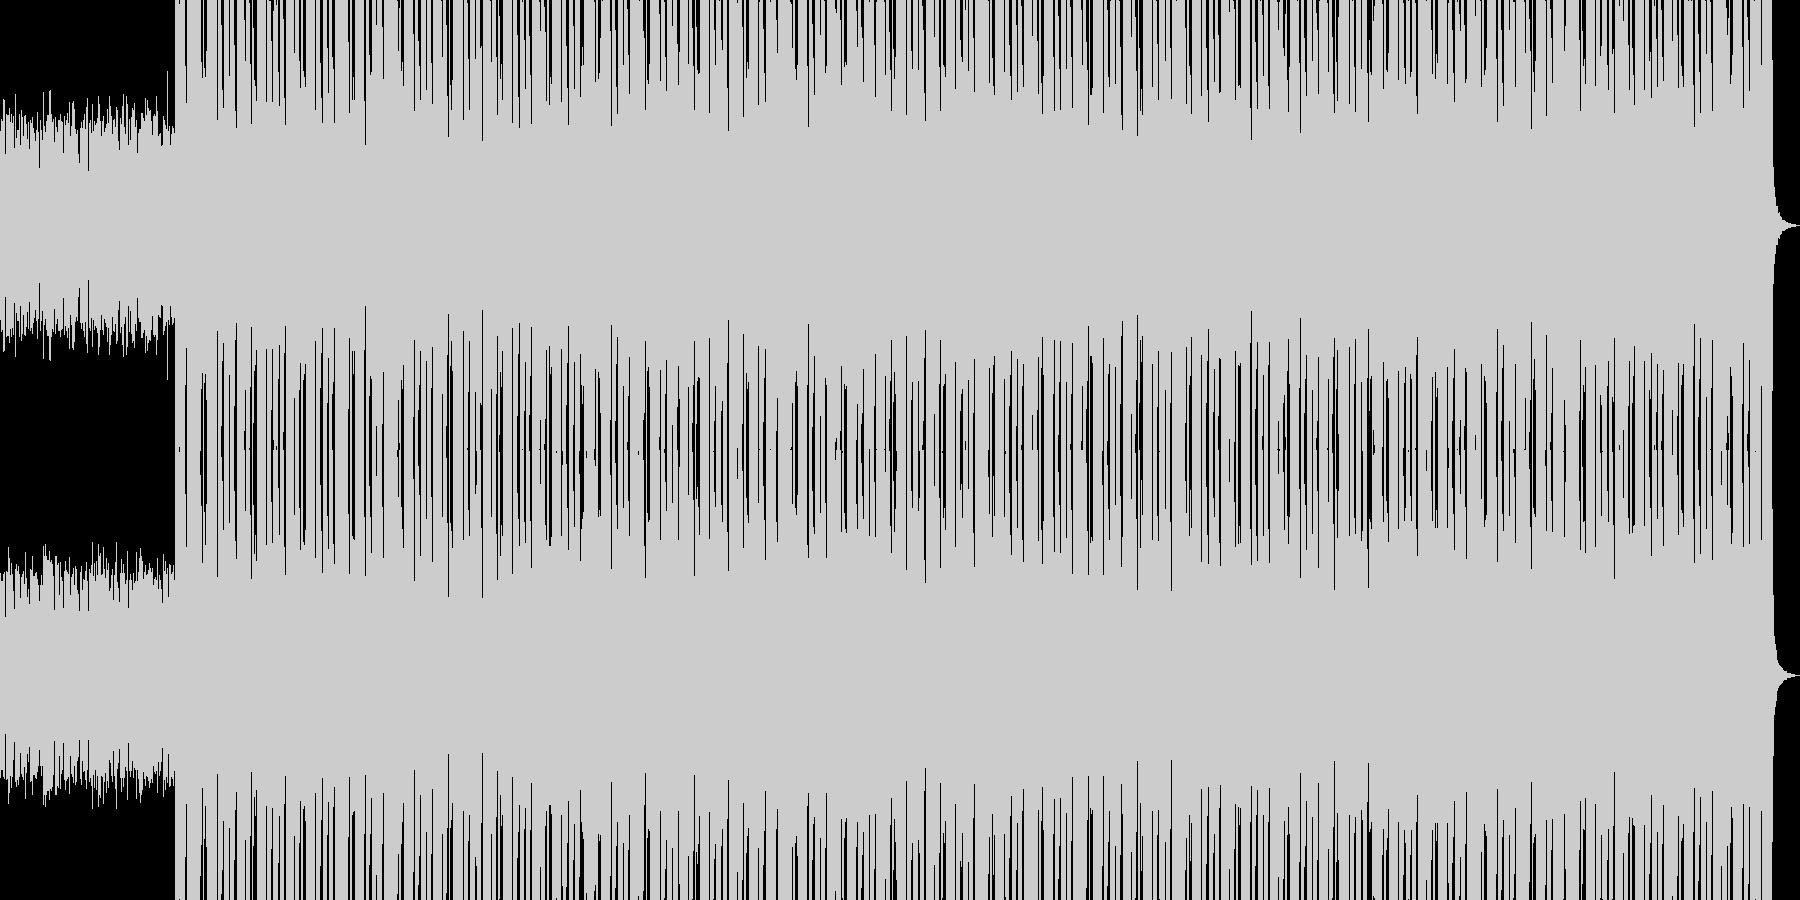 HIP HOP BEAT 03の未再生の波形